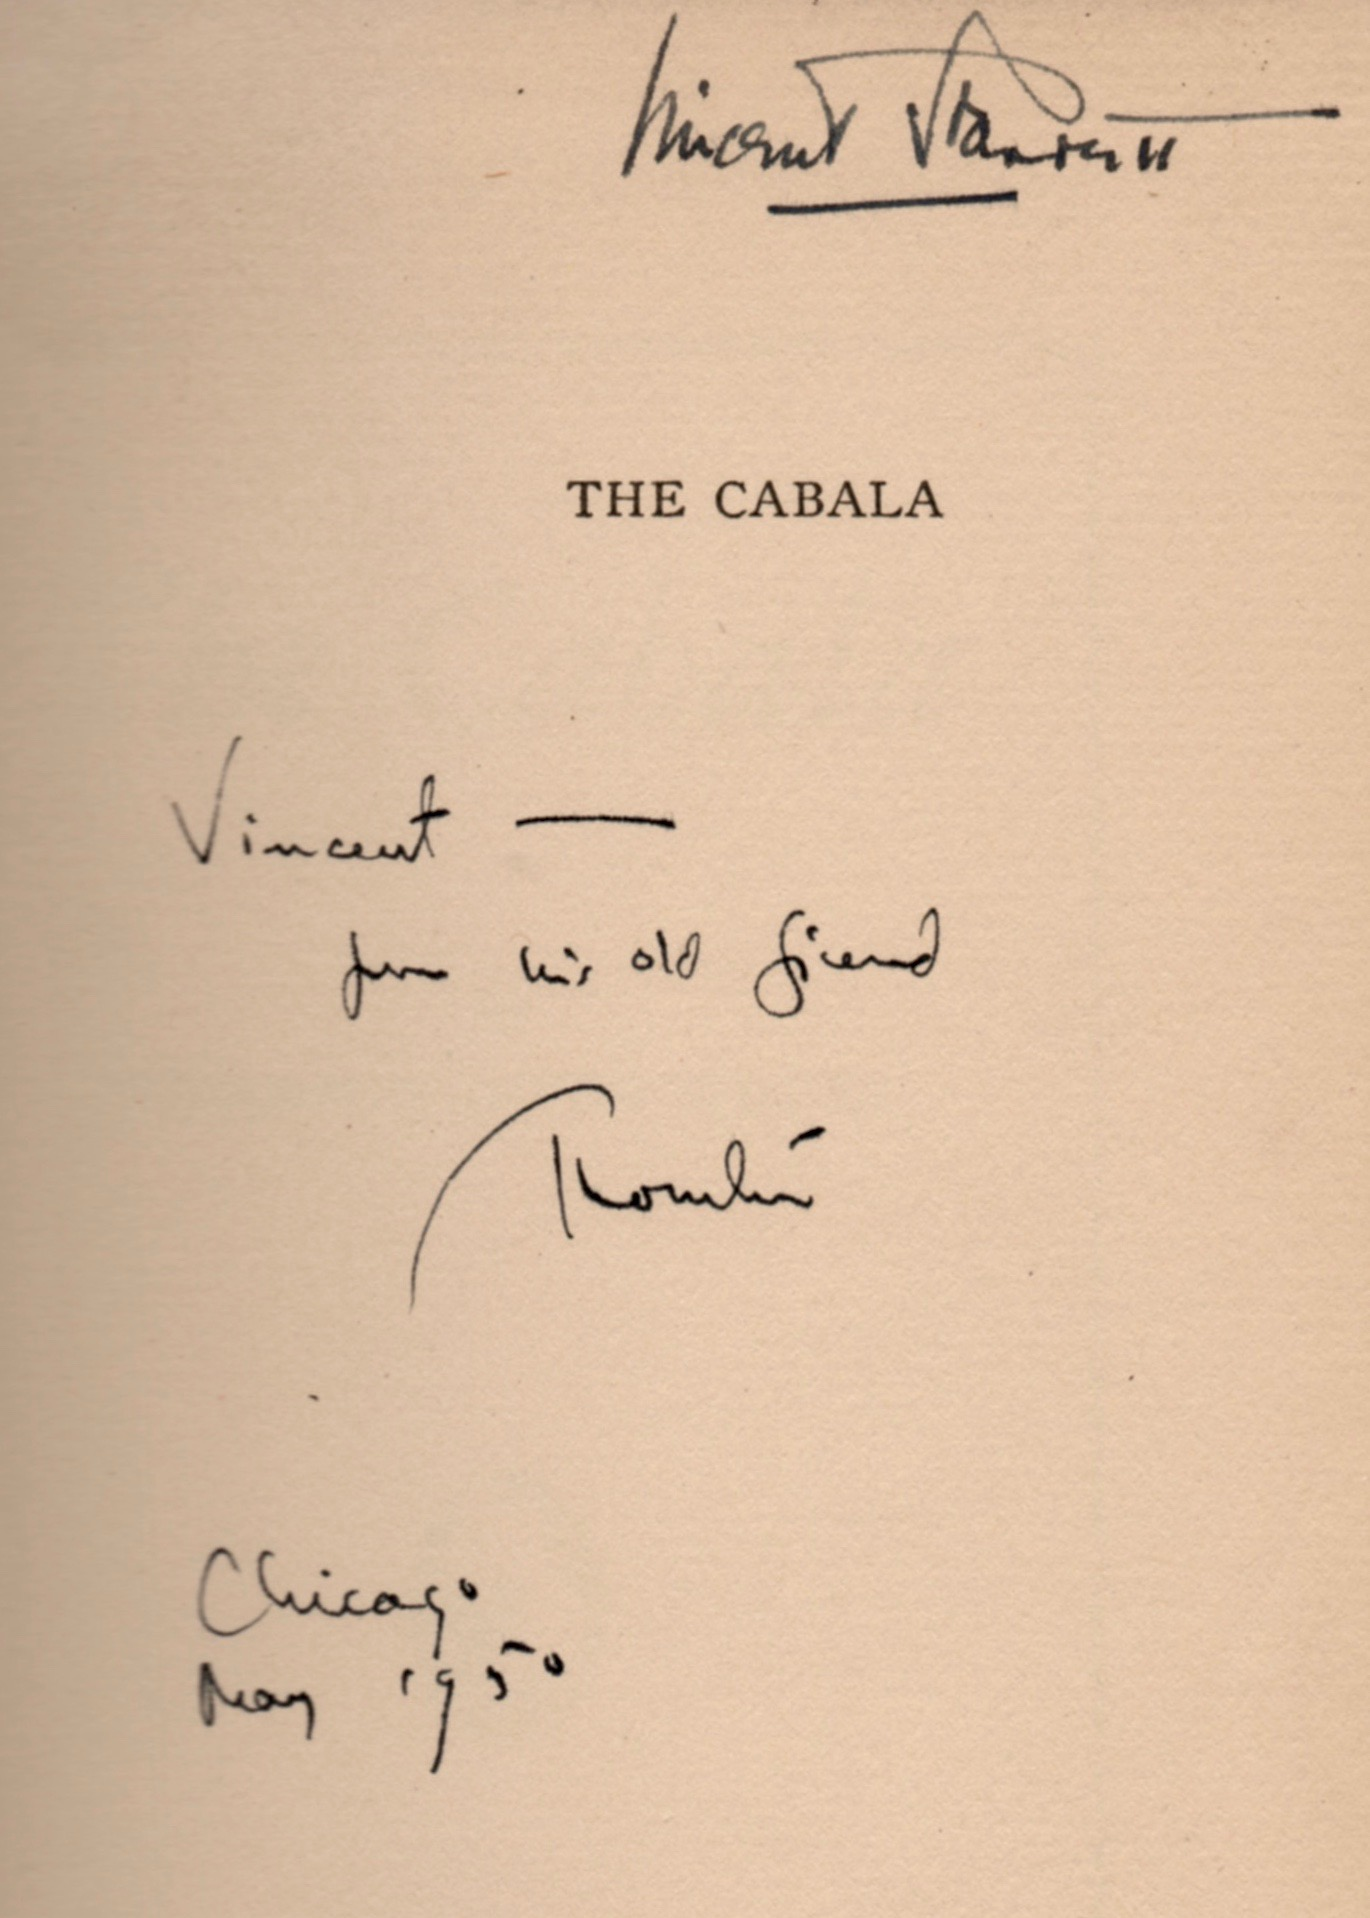 Thornton Wilder's inscription to Starrett